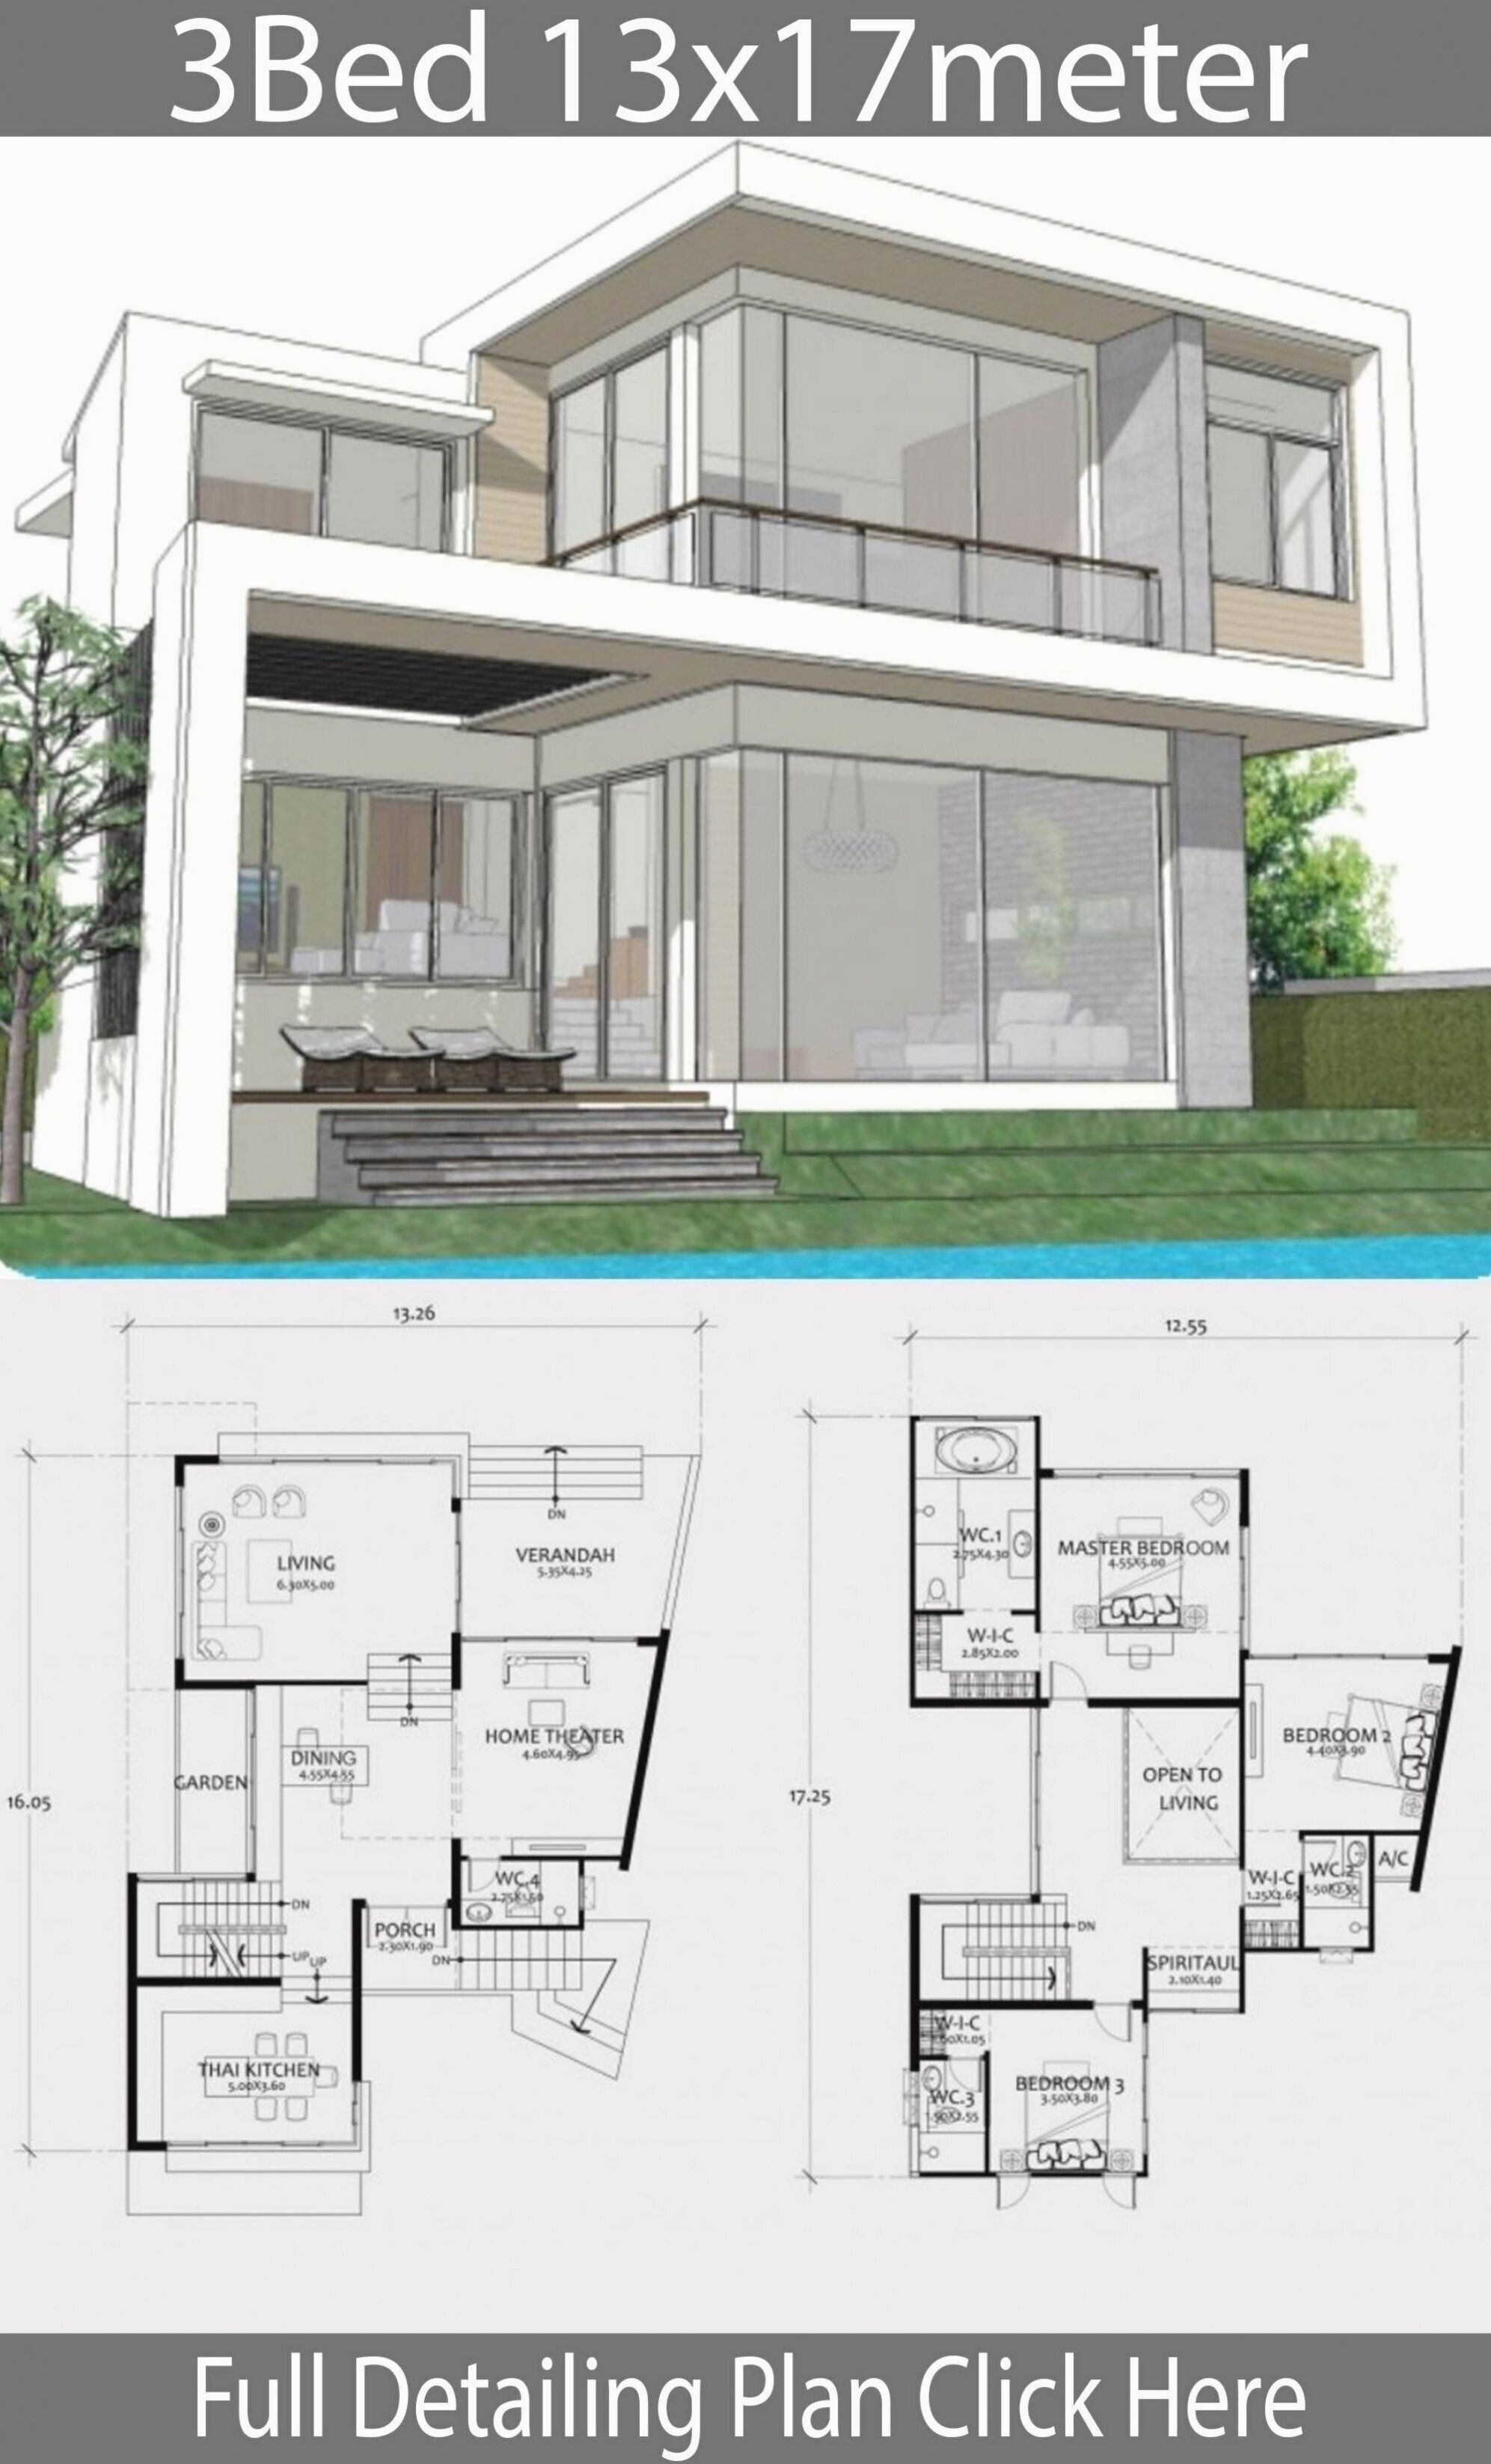 Pin Oleh Larkem Lamis Di Interieur Maison Design Arsitektur Rumah Rumah Indah Arsitektur